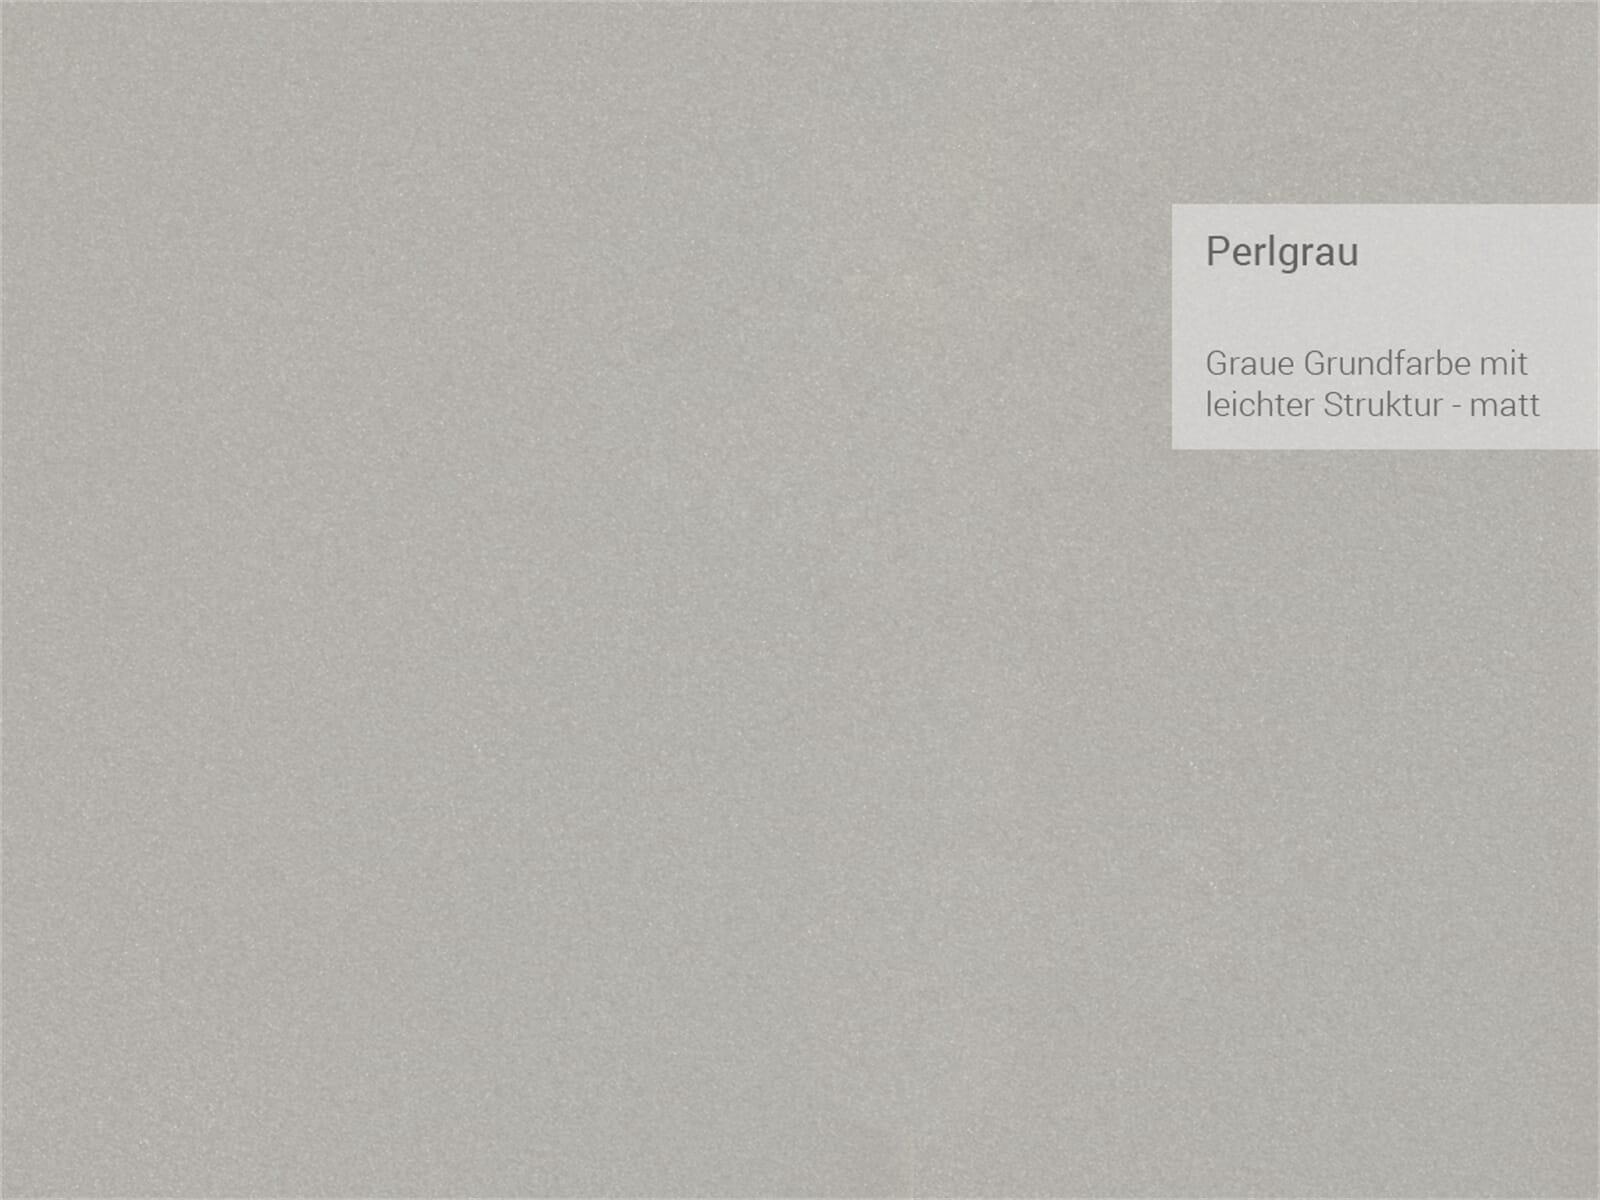 Franke Mythos MTK 611-78 Perlgrau – 10973 Keramikspüle Exzenterbetätigung